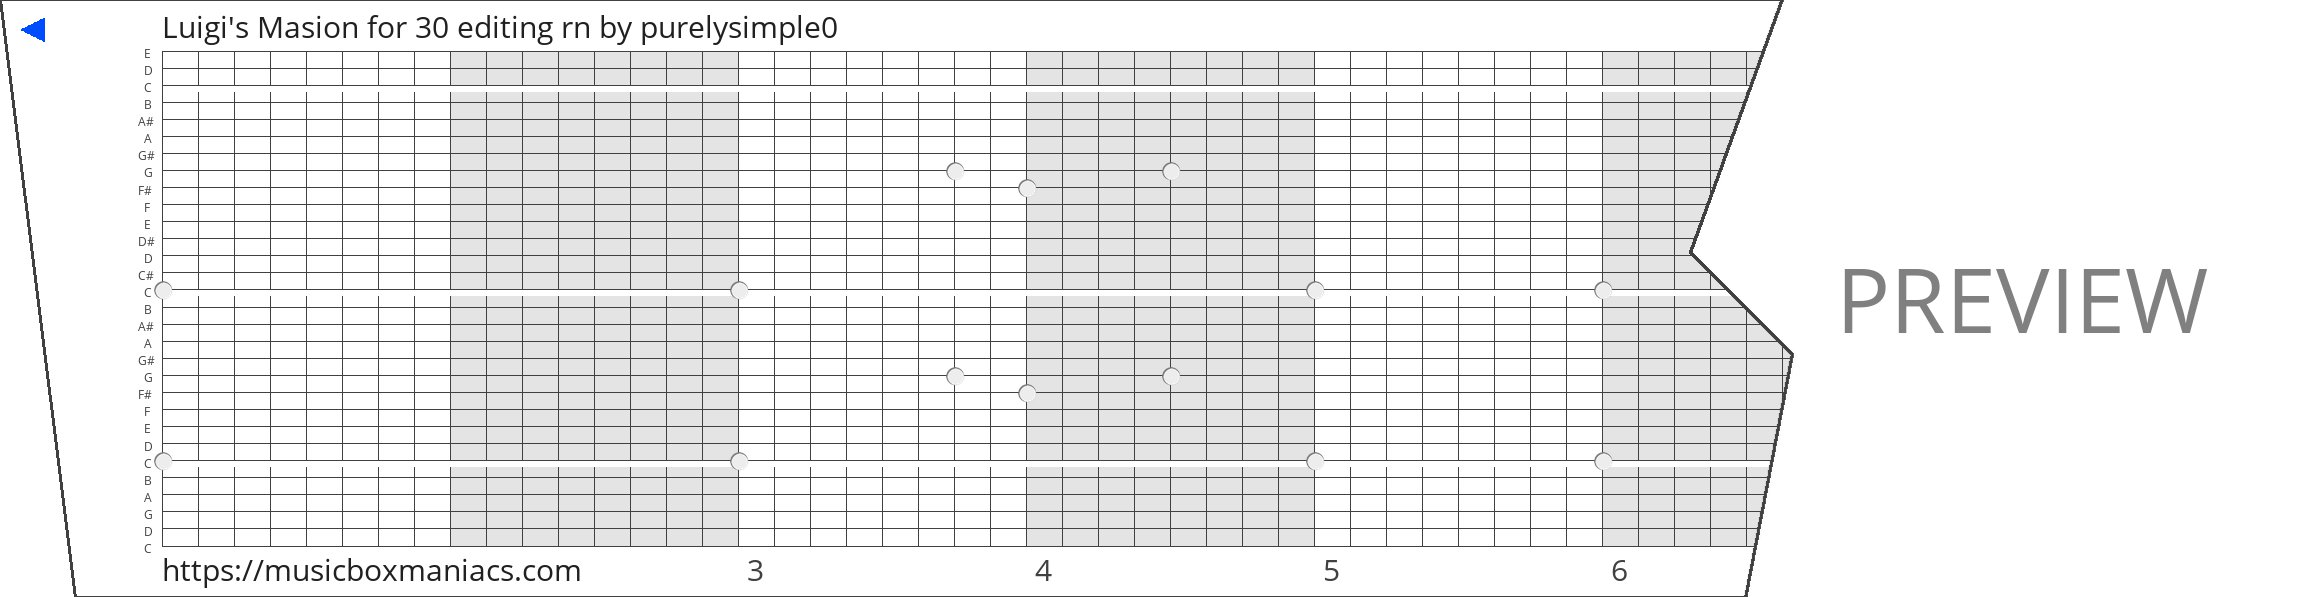 Luigi's Masion for 30 editing rn 30 note music box paper strip